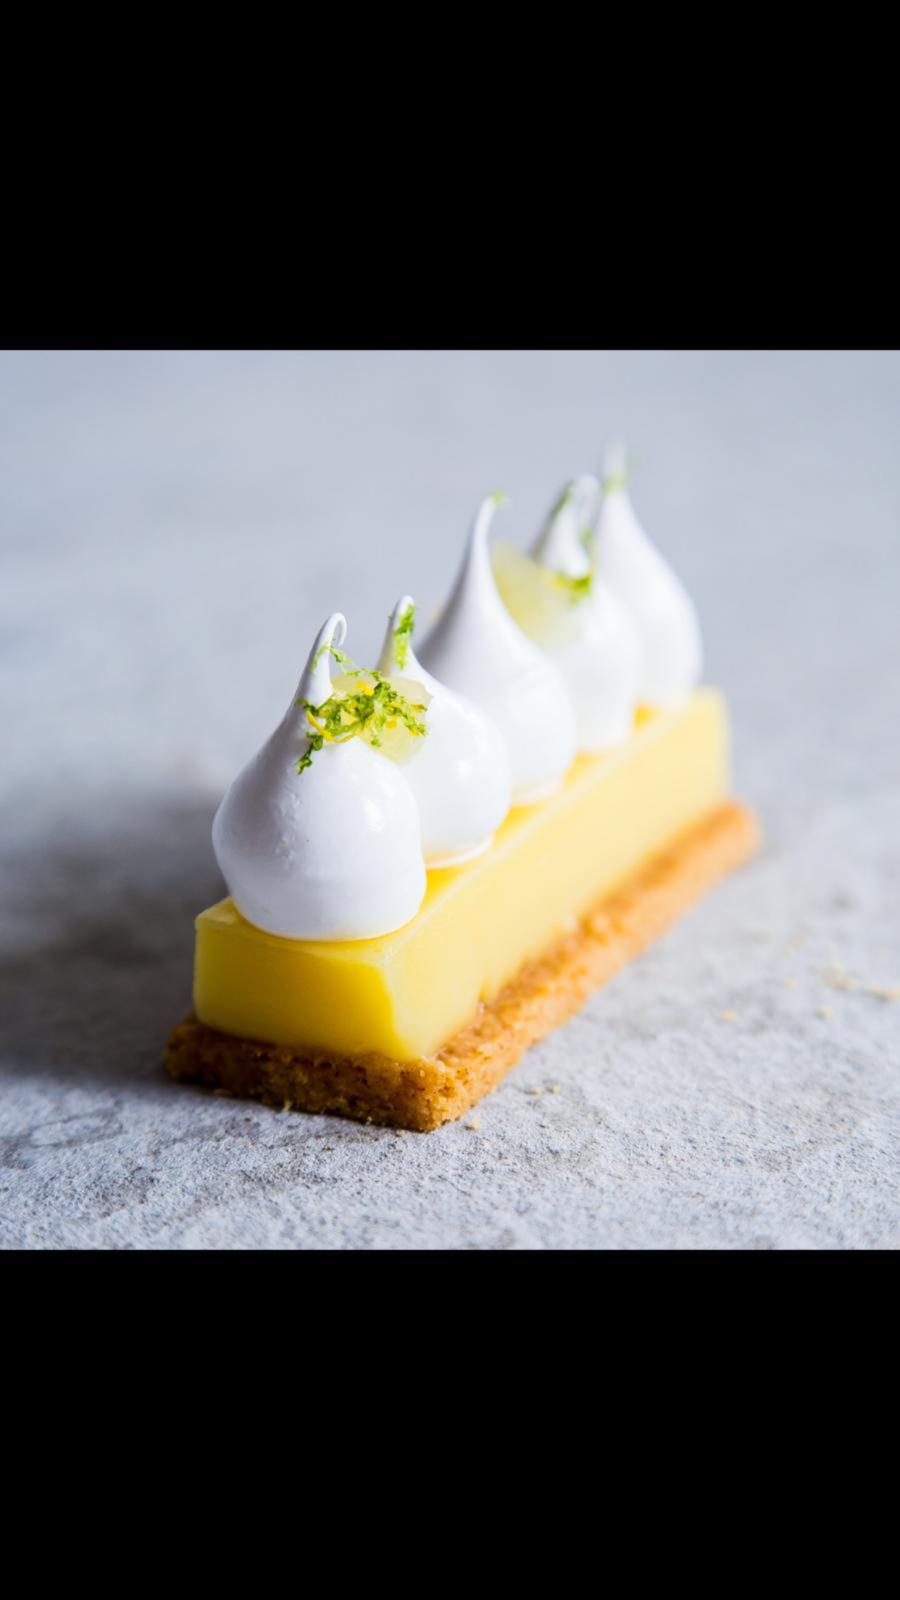 Lemon Pie Reconstructed